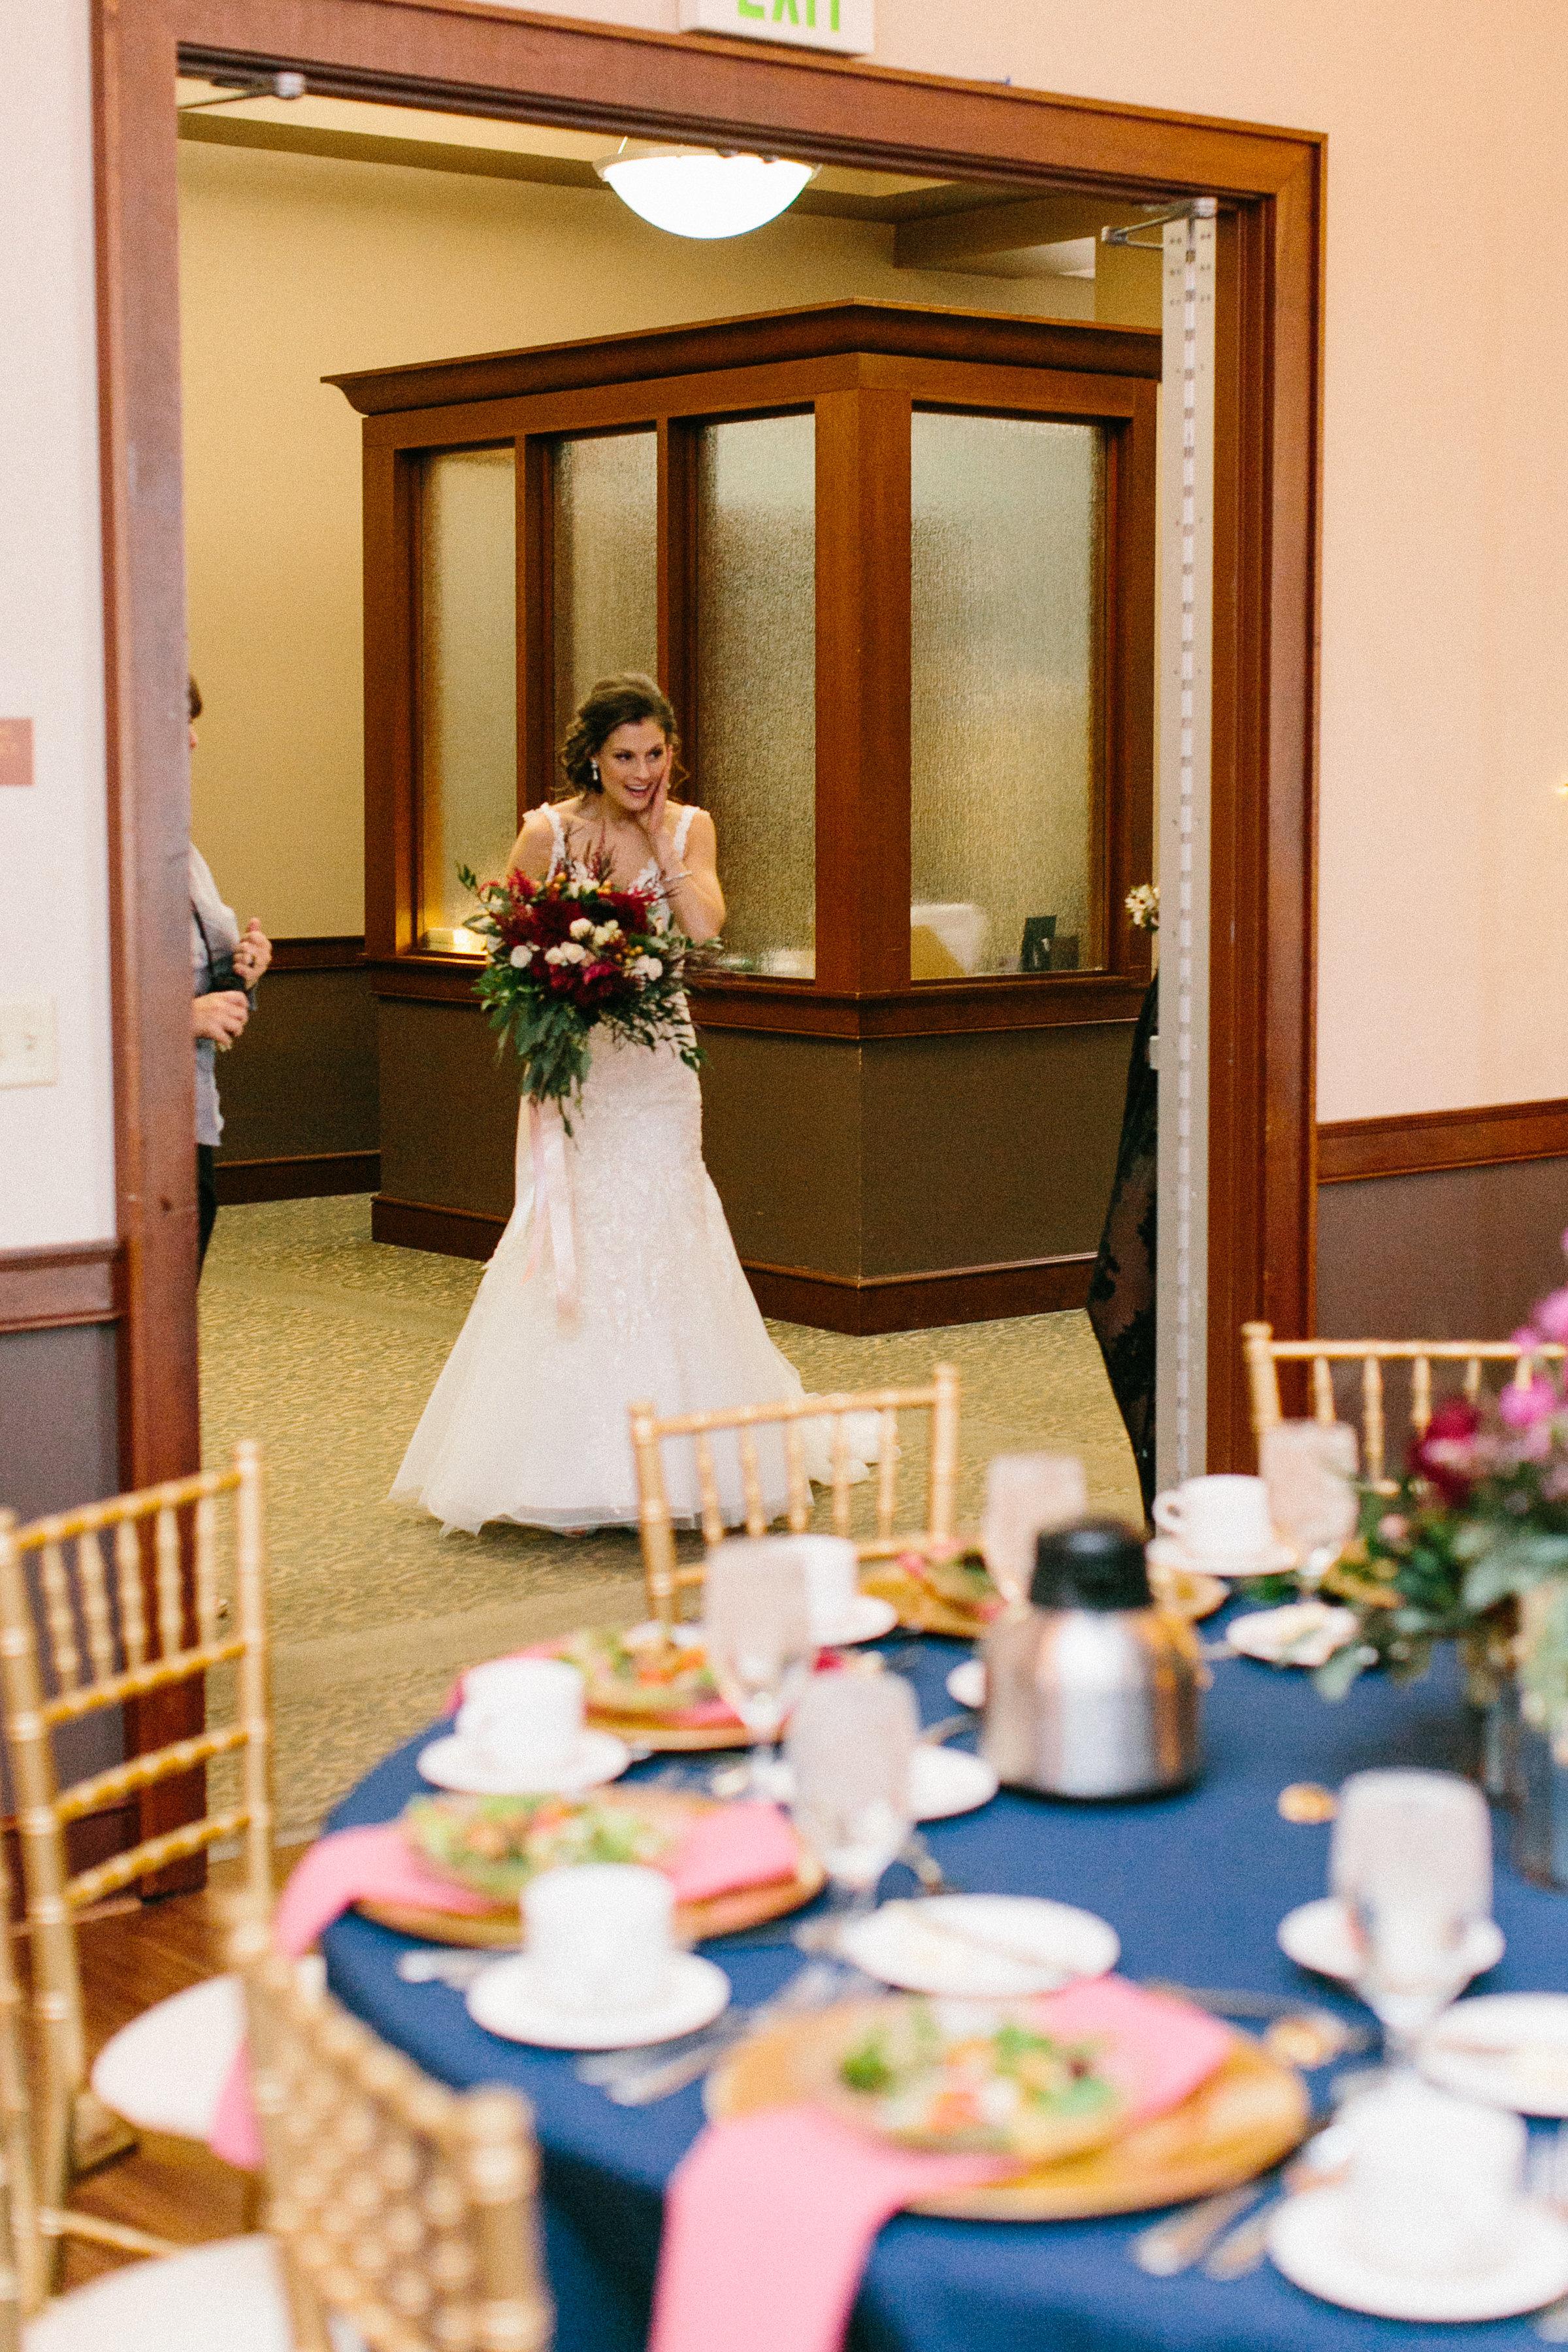 2017_Carly_Milbrath_Jefferson_Street_Inn_Wedding_Wausau_WI_414.JPG